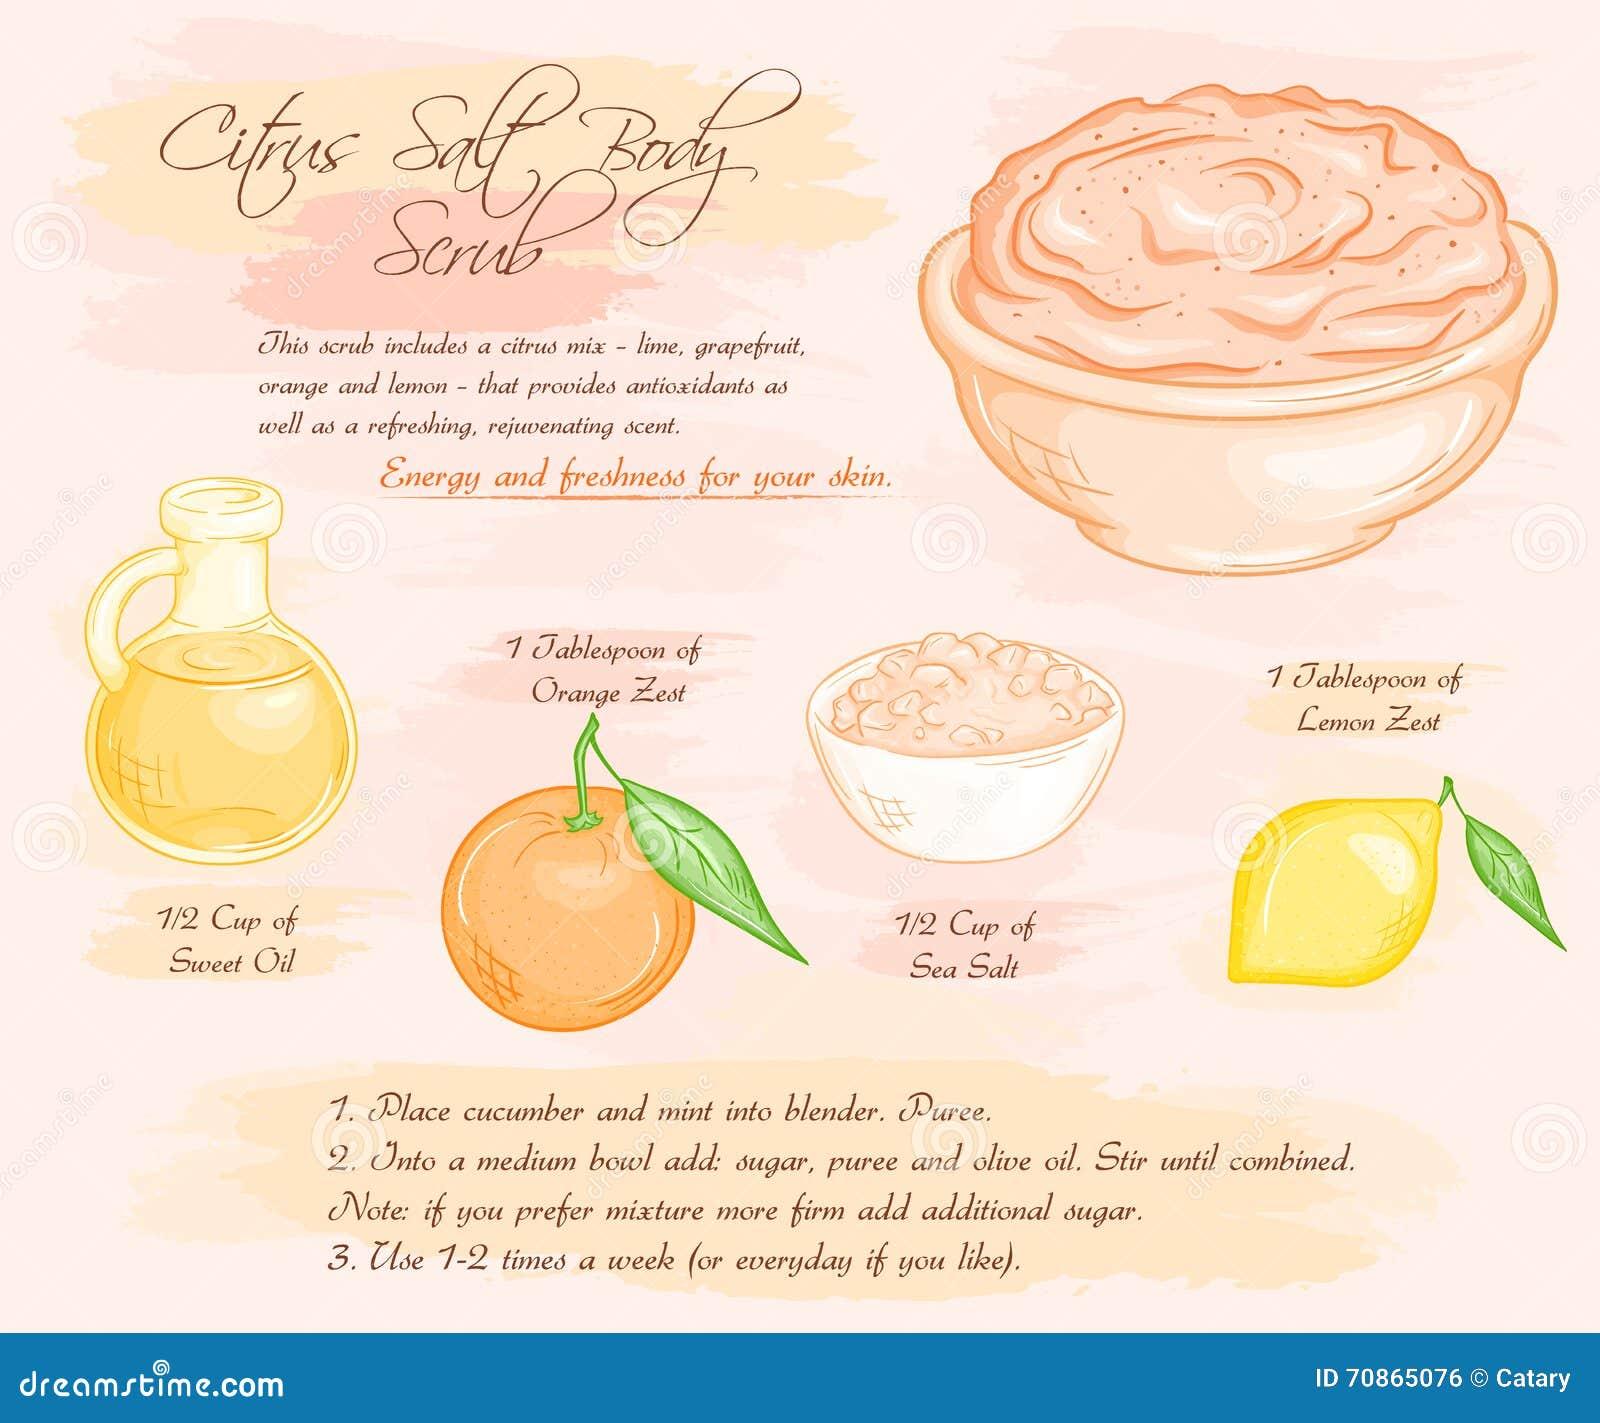 Vector hand drawn illustration of energy citrus salt body scrub recipe